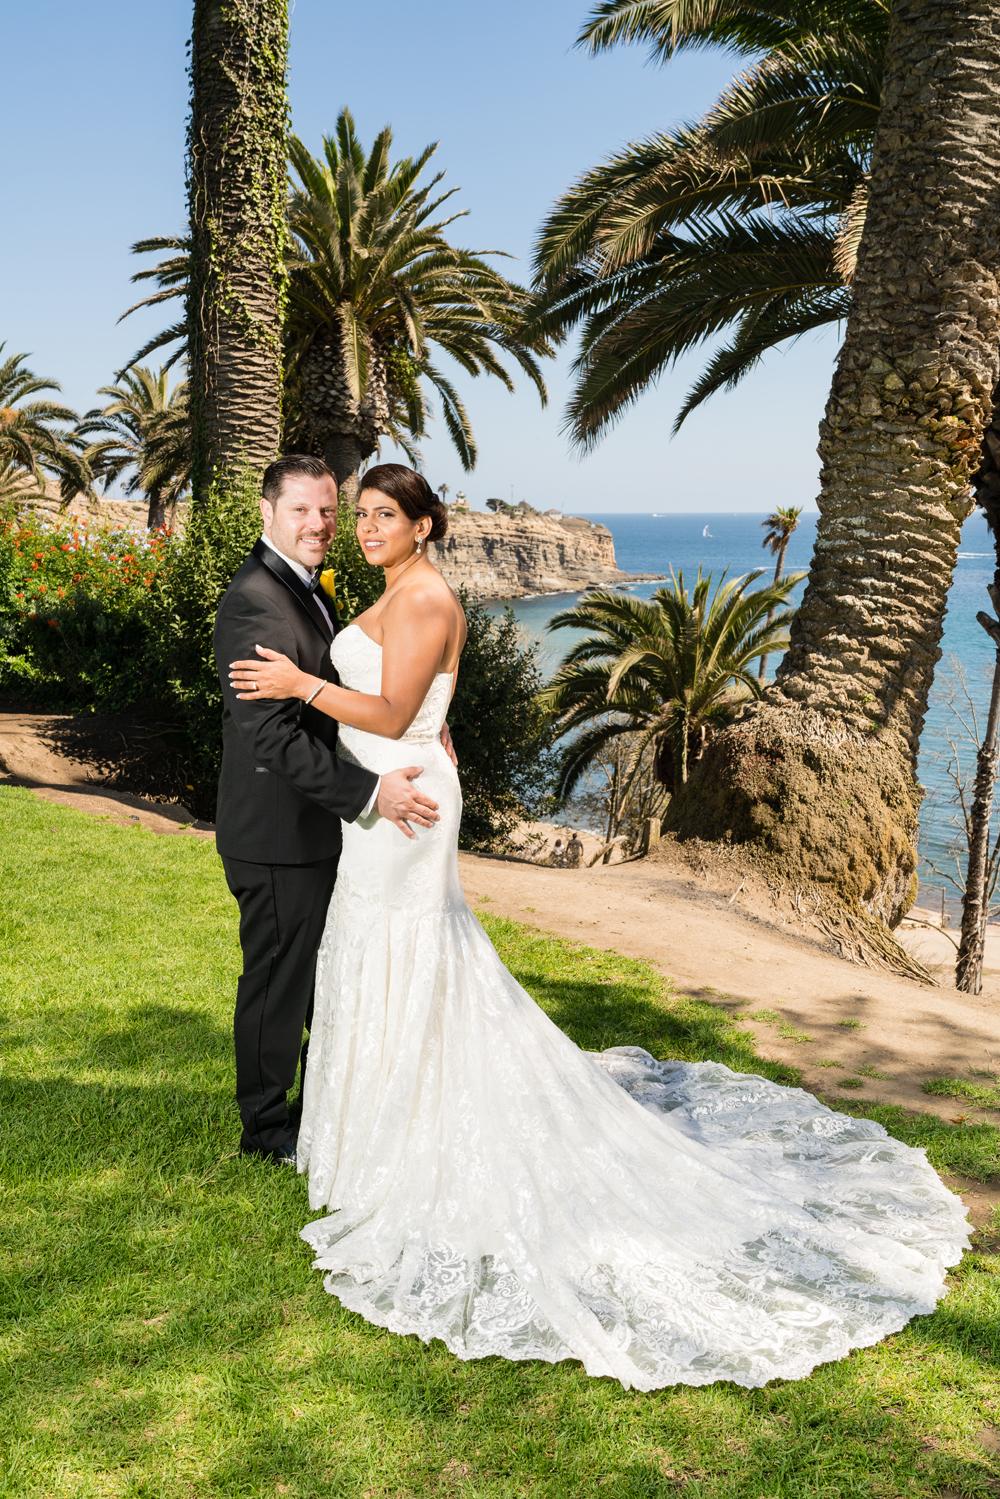 c2ec0-lively-navy-yellow-harbor-wedding-beautiful-couple-harborside.jpg